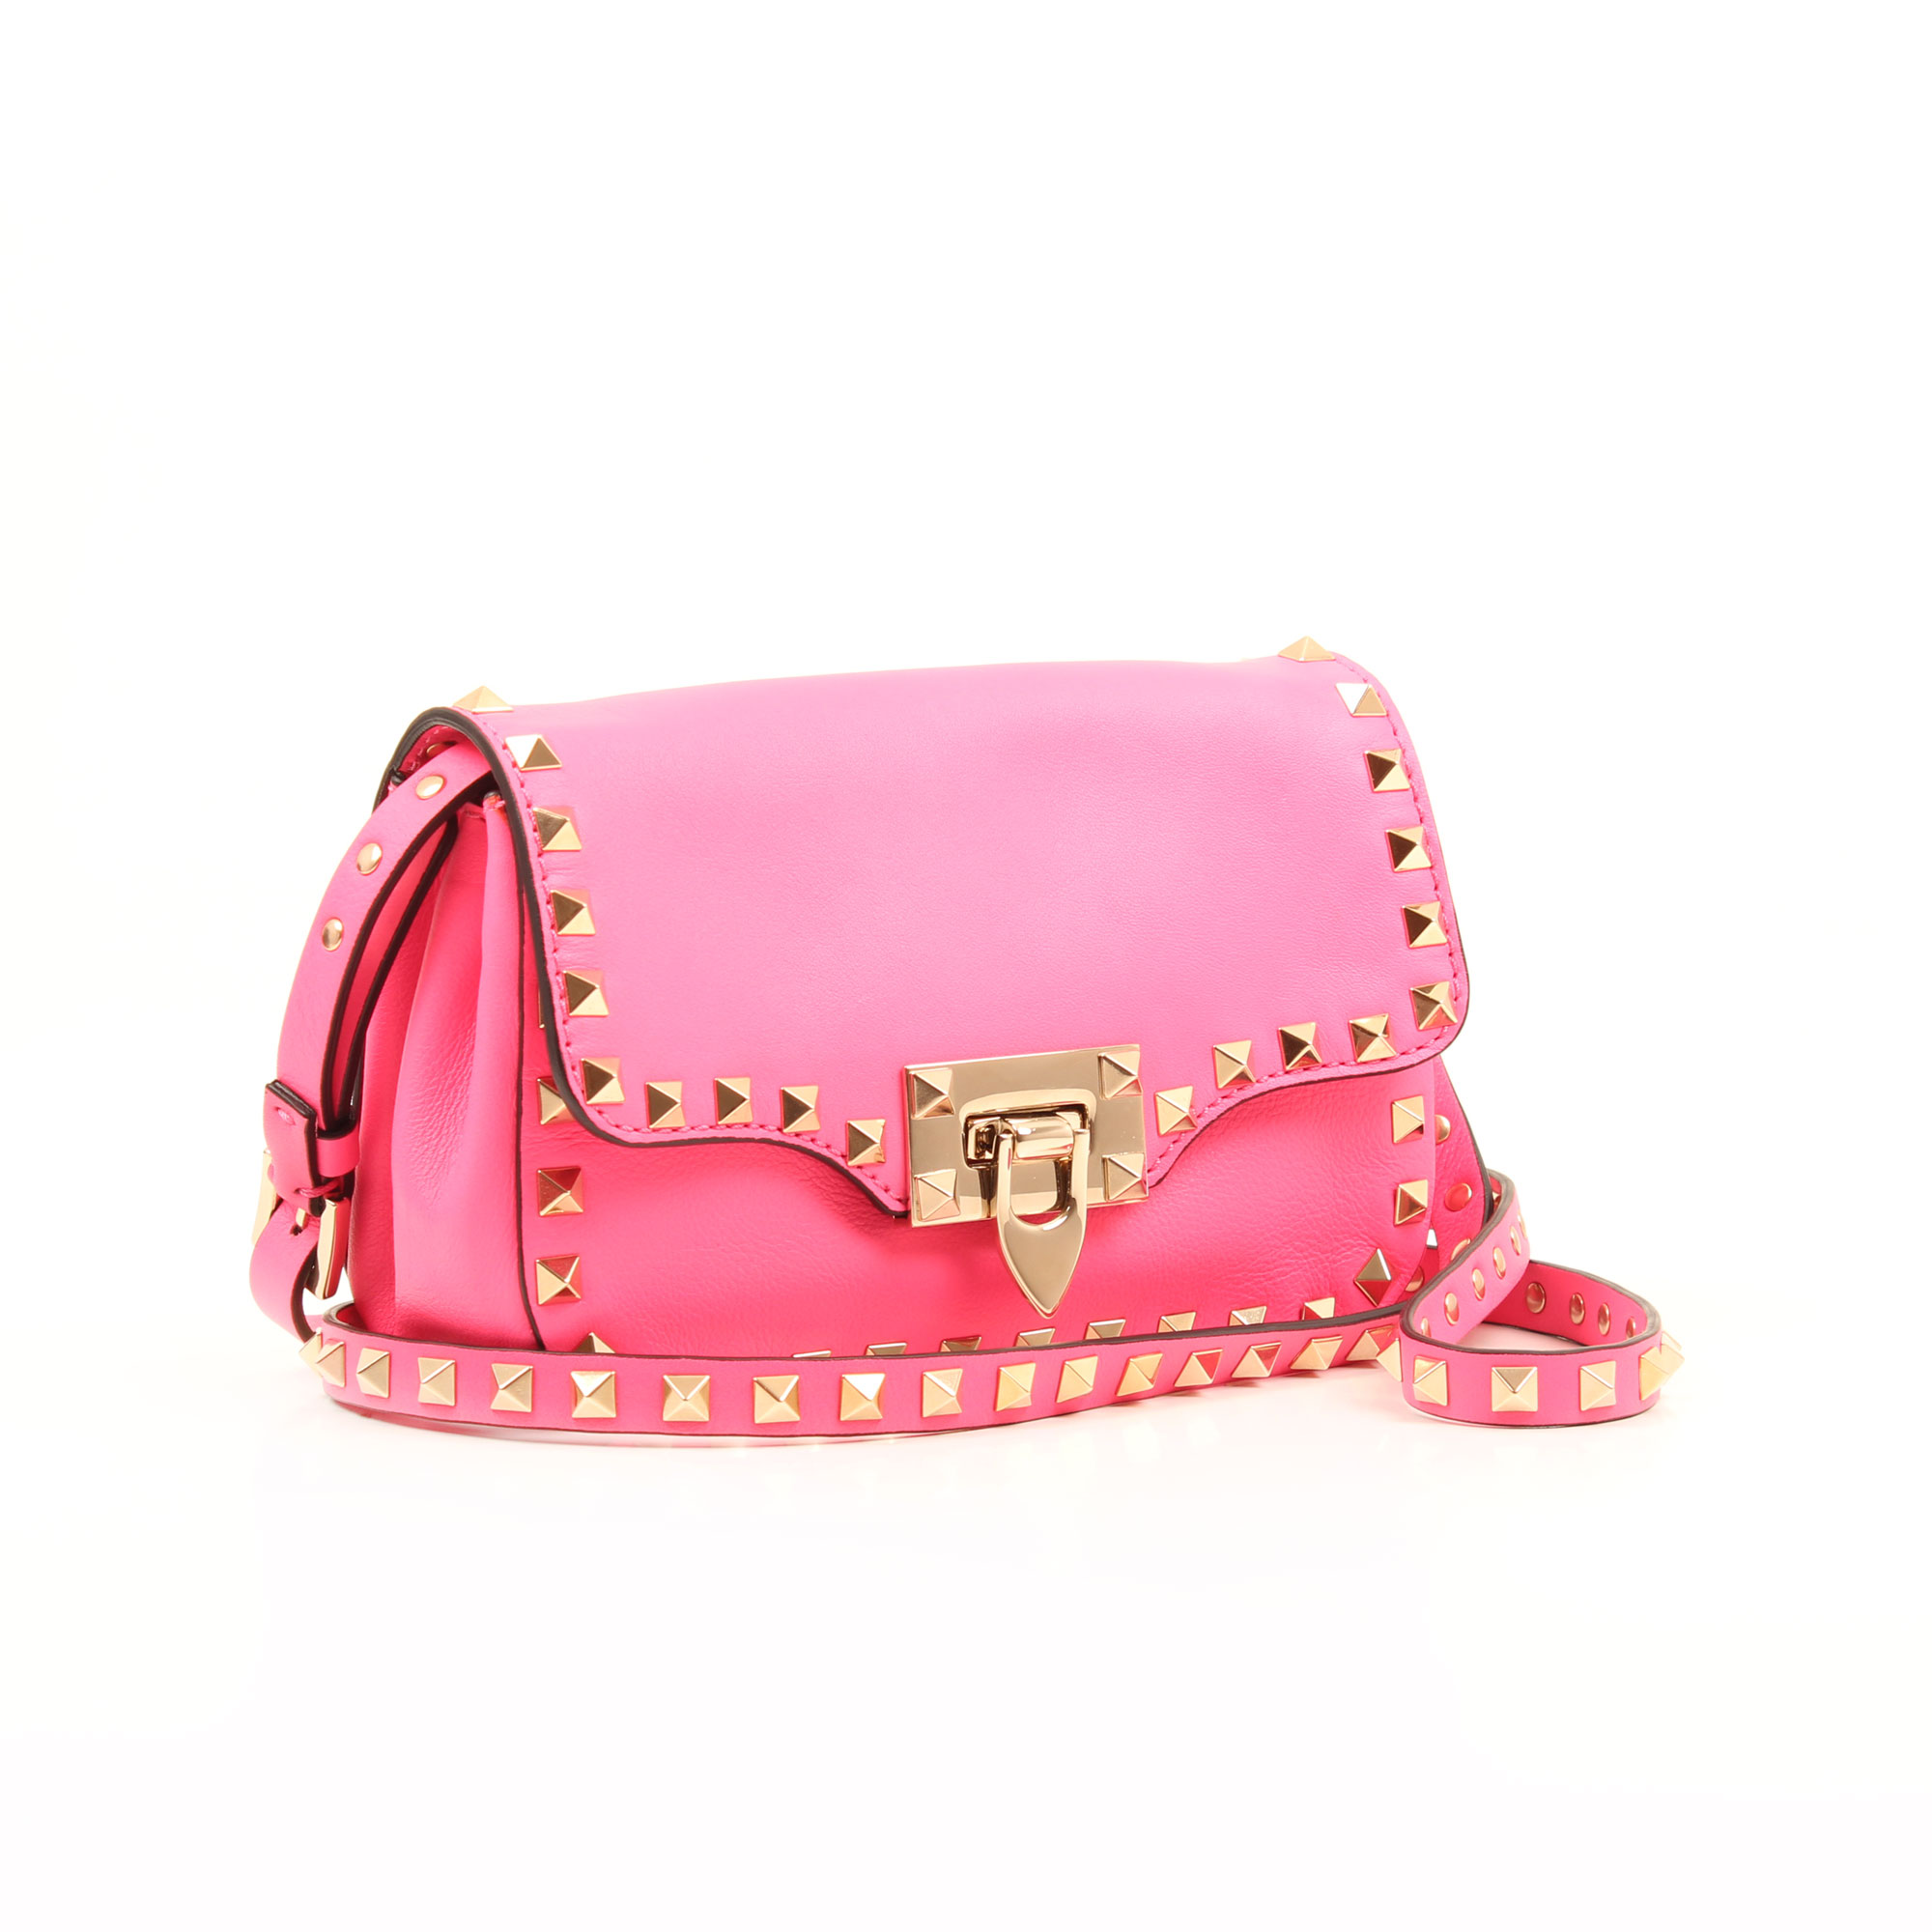 Imagen general del bolso valentino mini rockstud rosa